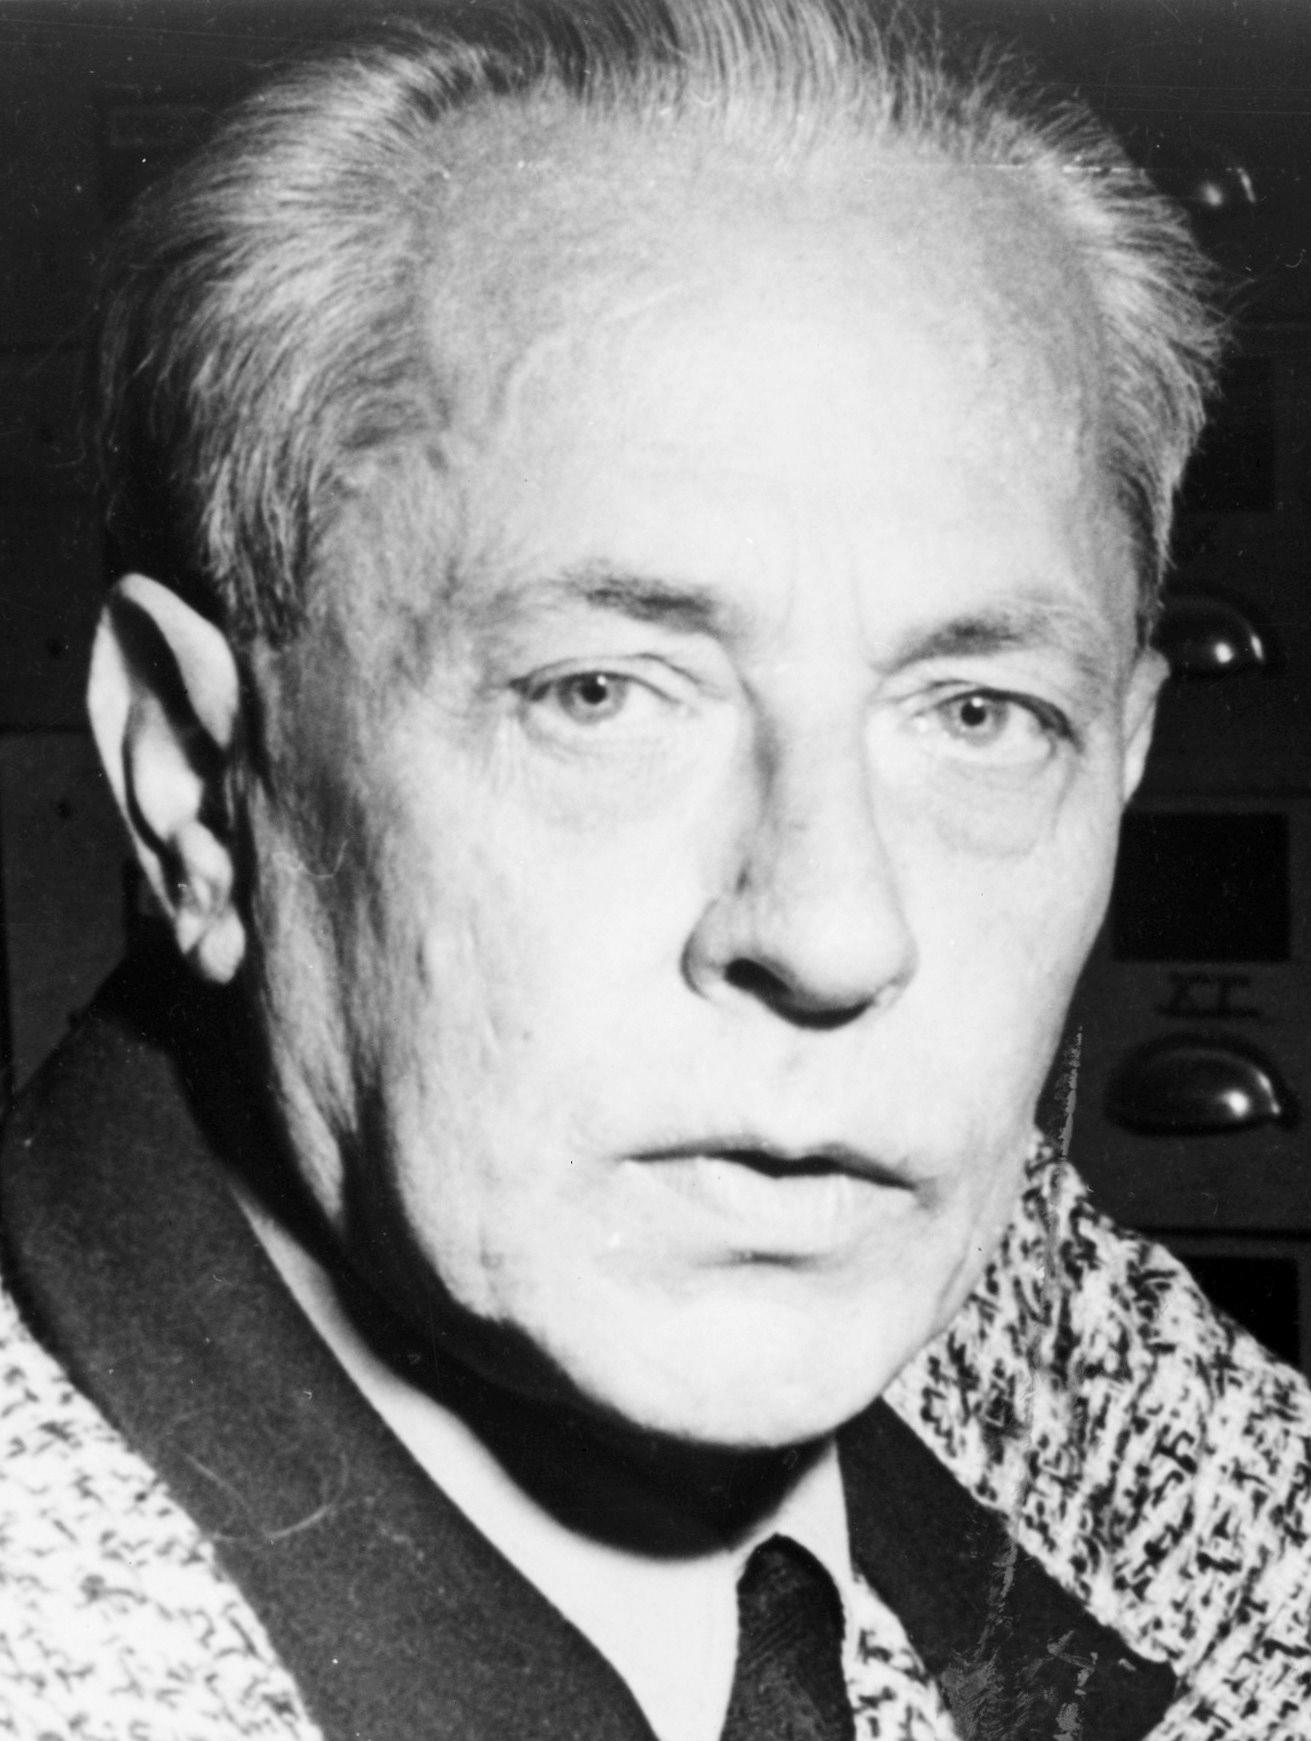 Image of Heinrich Hoffmann from Wikidata